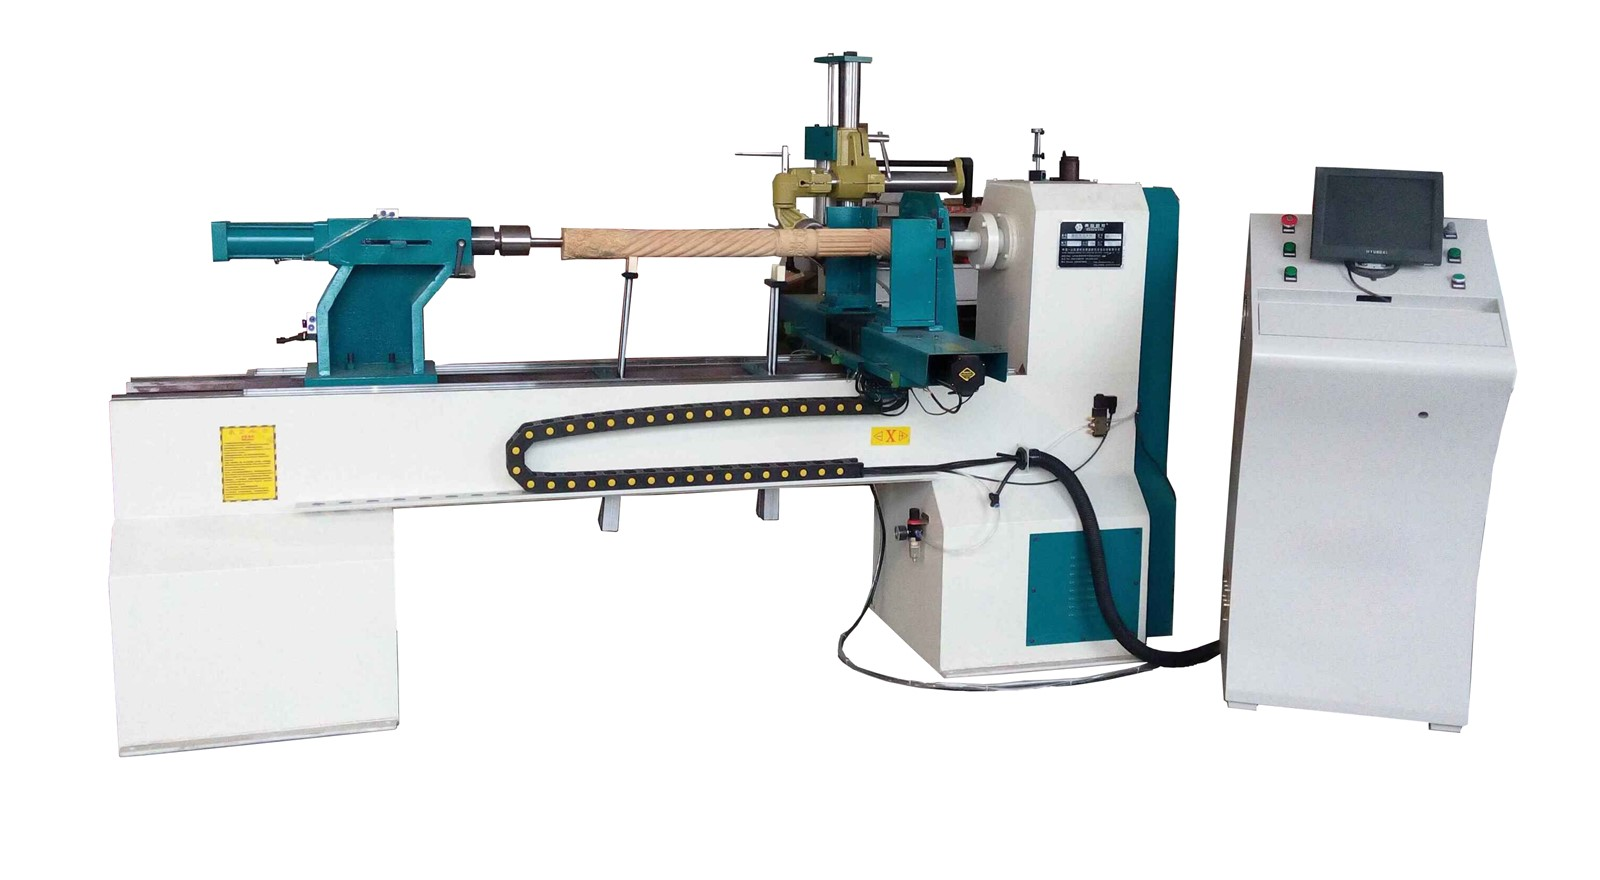 Cnc Wood Turning Machine Cnc Lathe For Wood From China